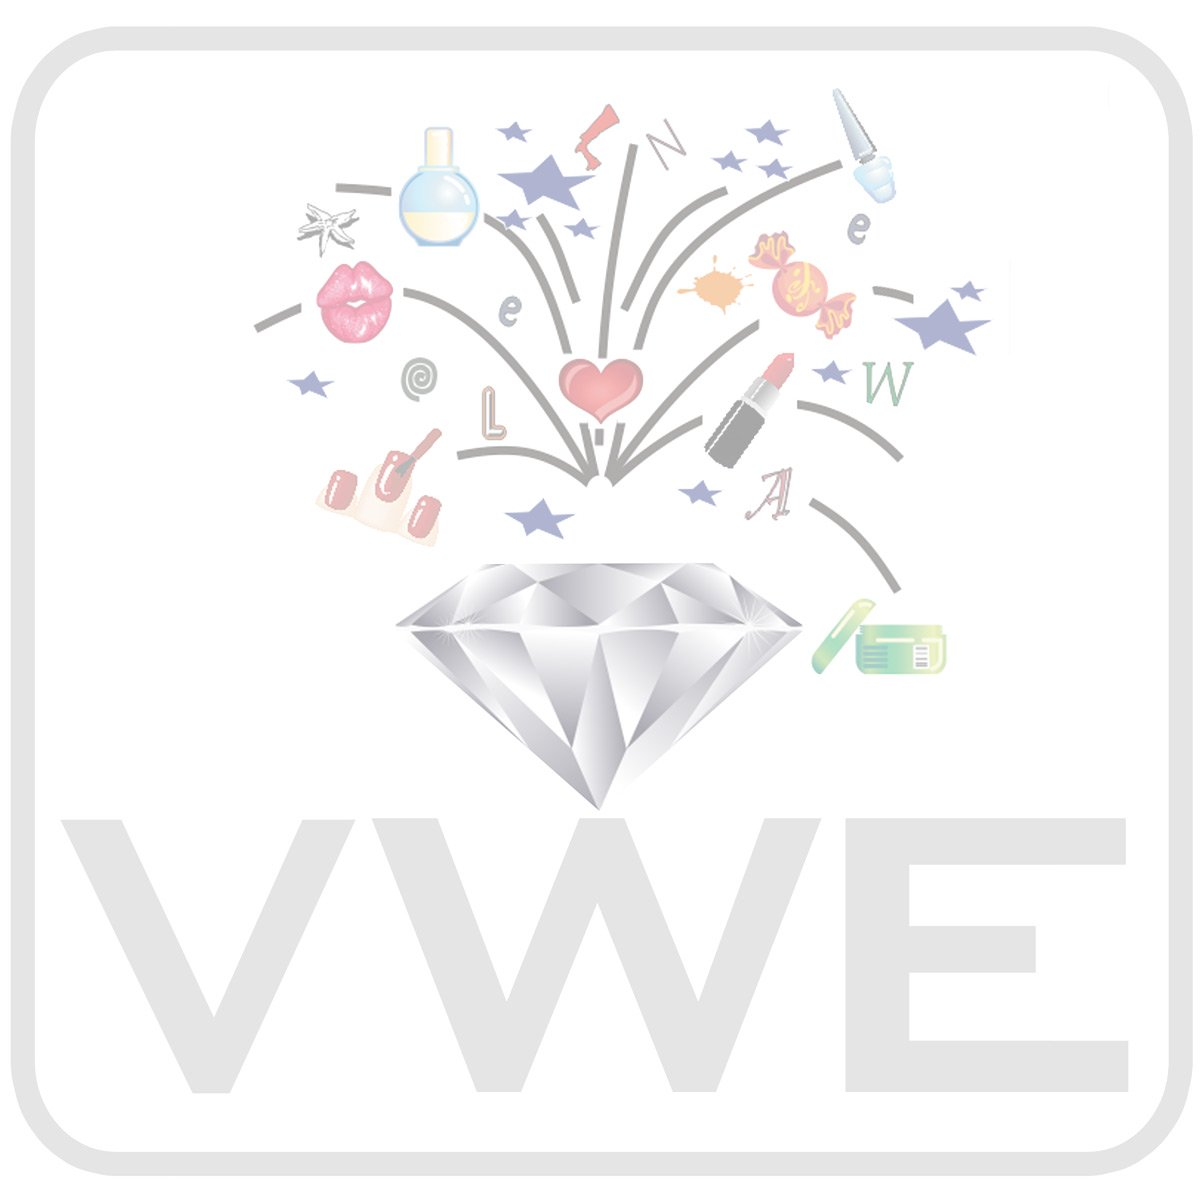 UV Gel Crystal Crush, 5ml  [7 / 10]